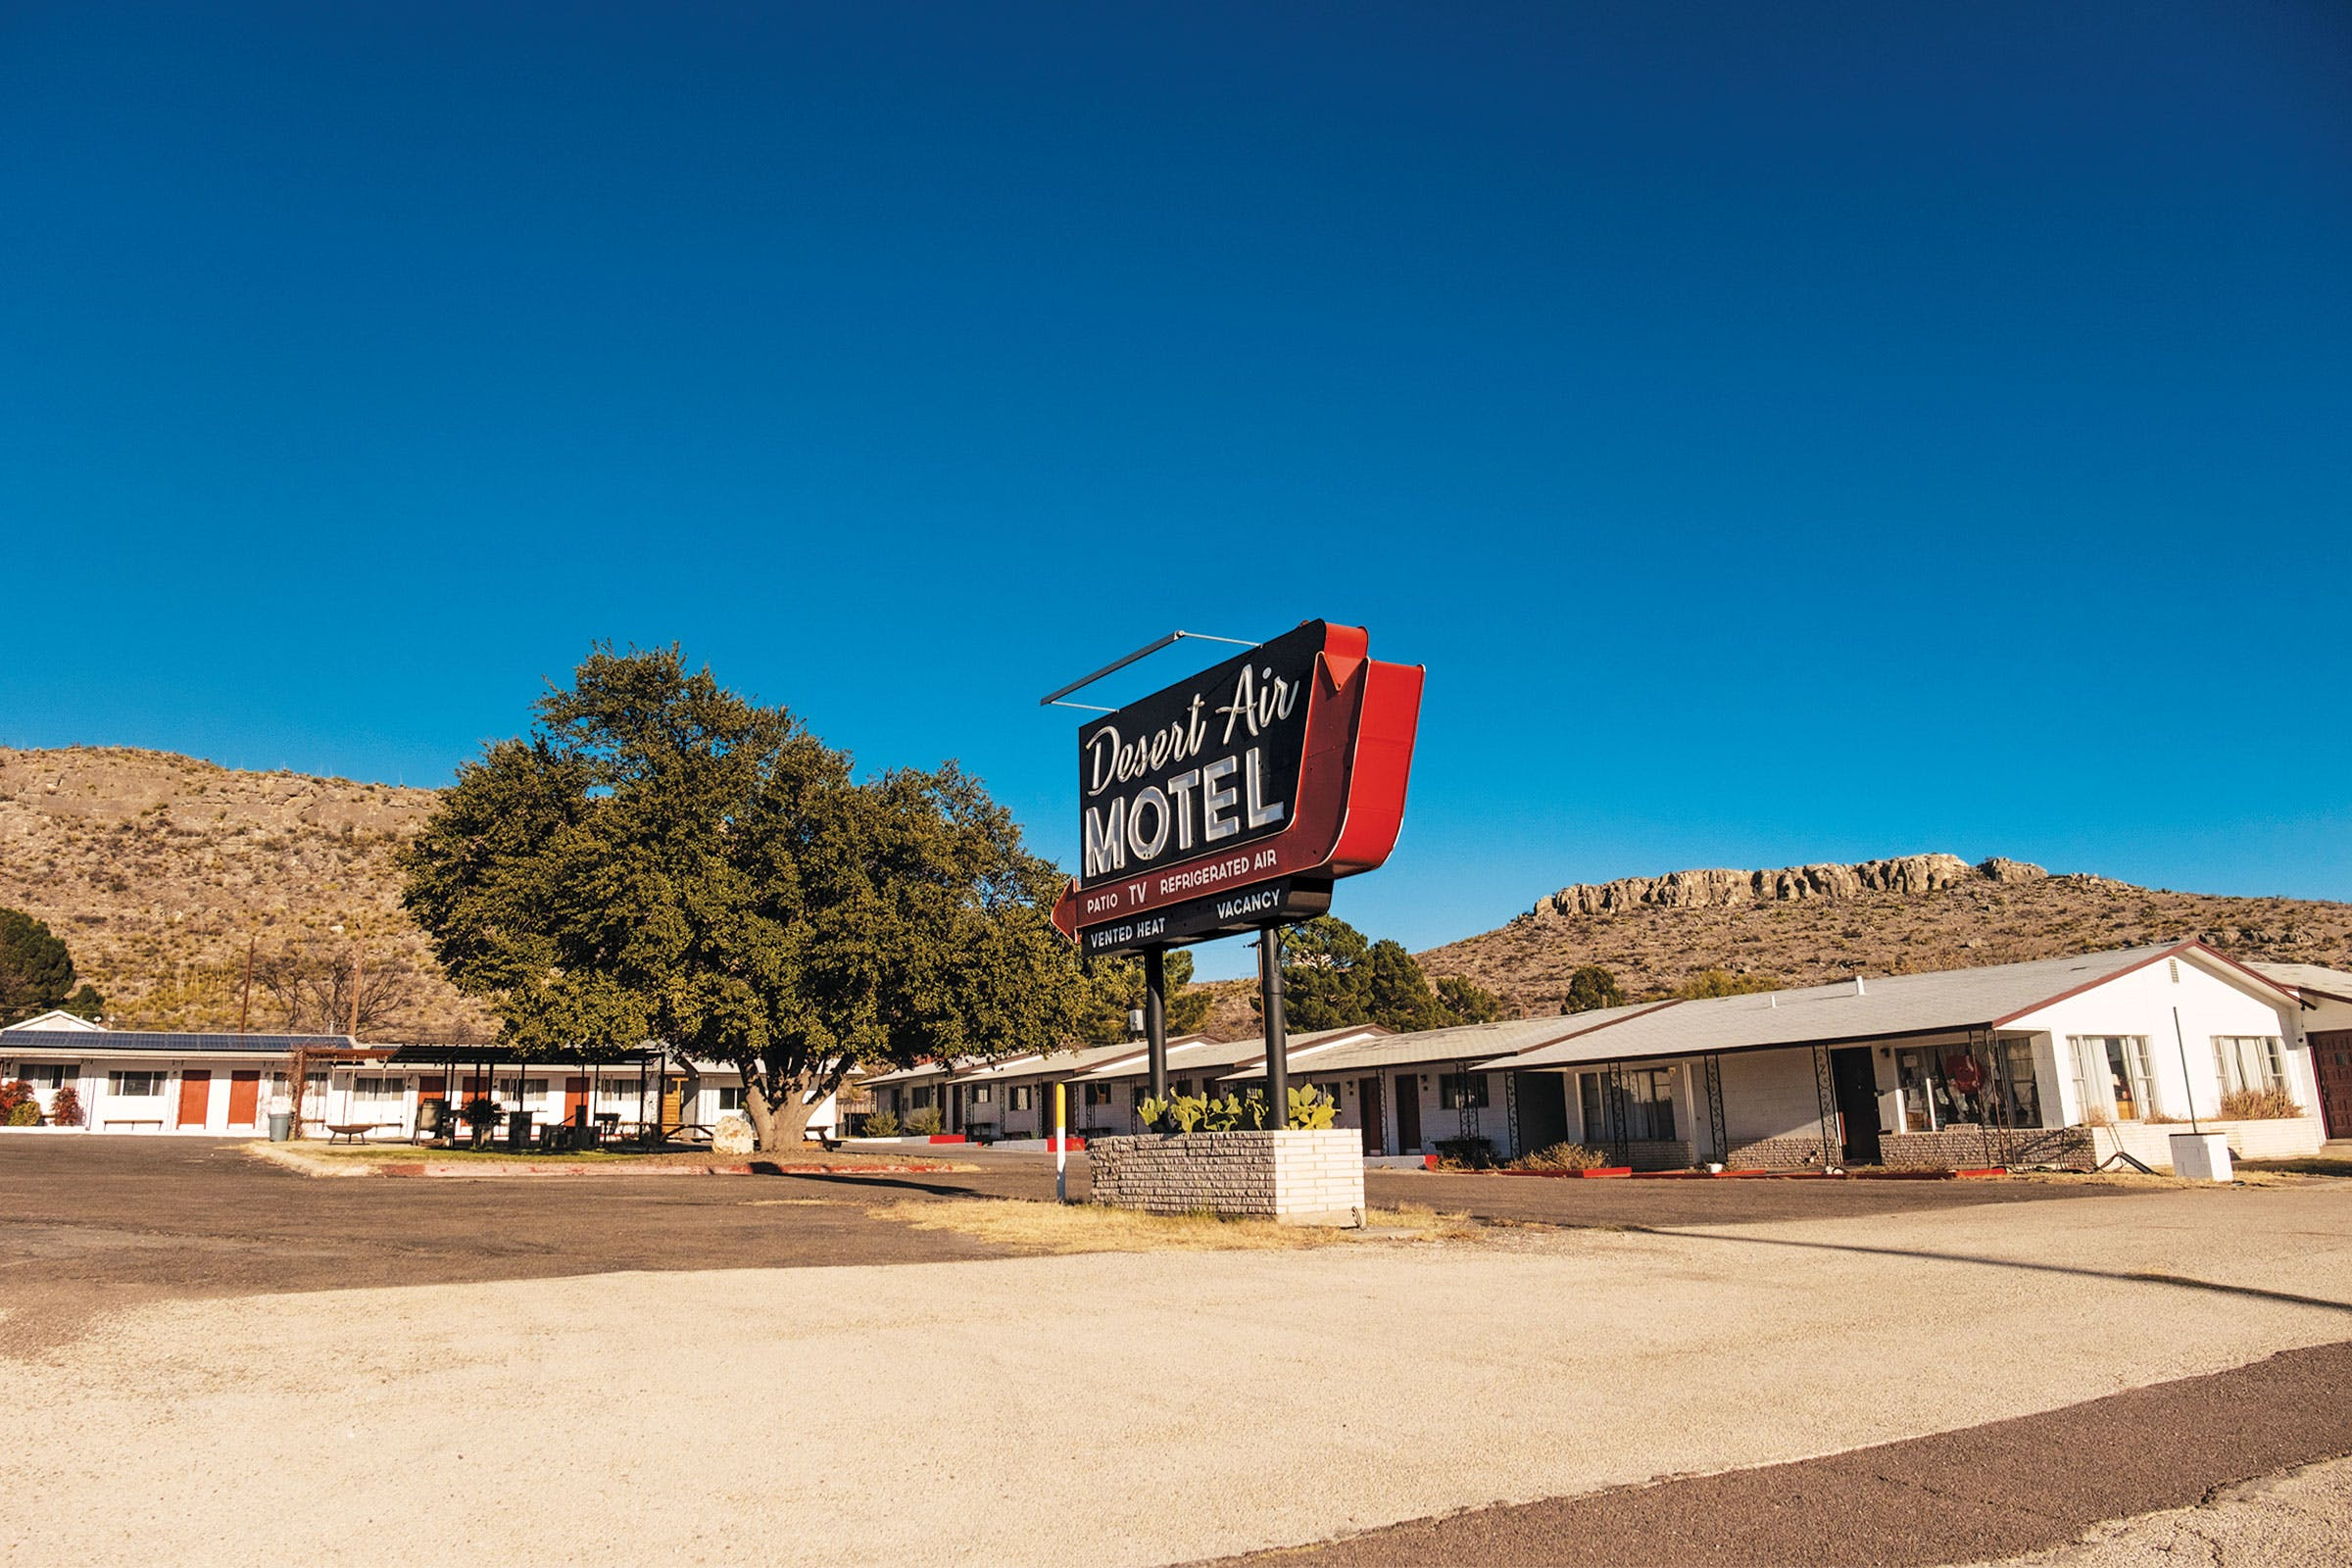 sanderson-big-bend-desert-air-motel